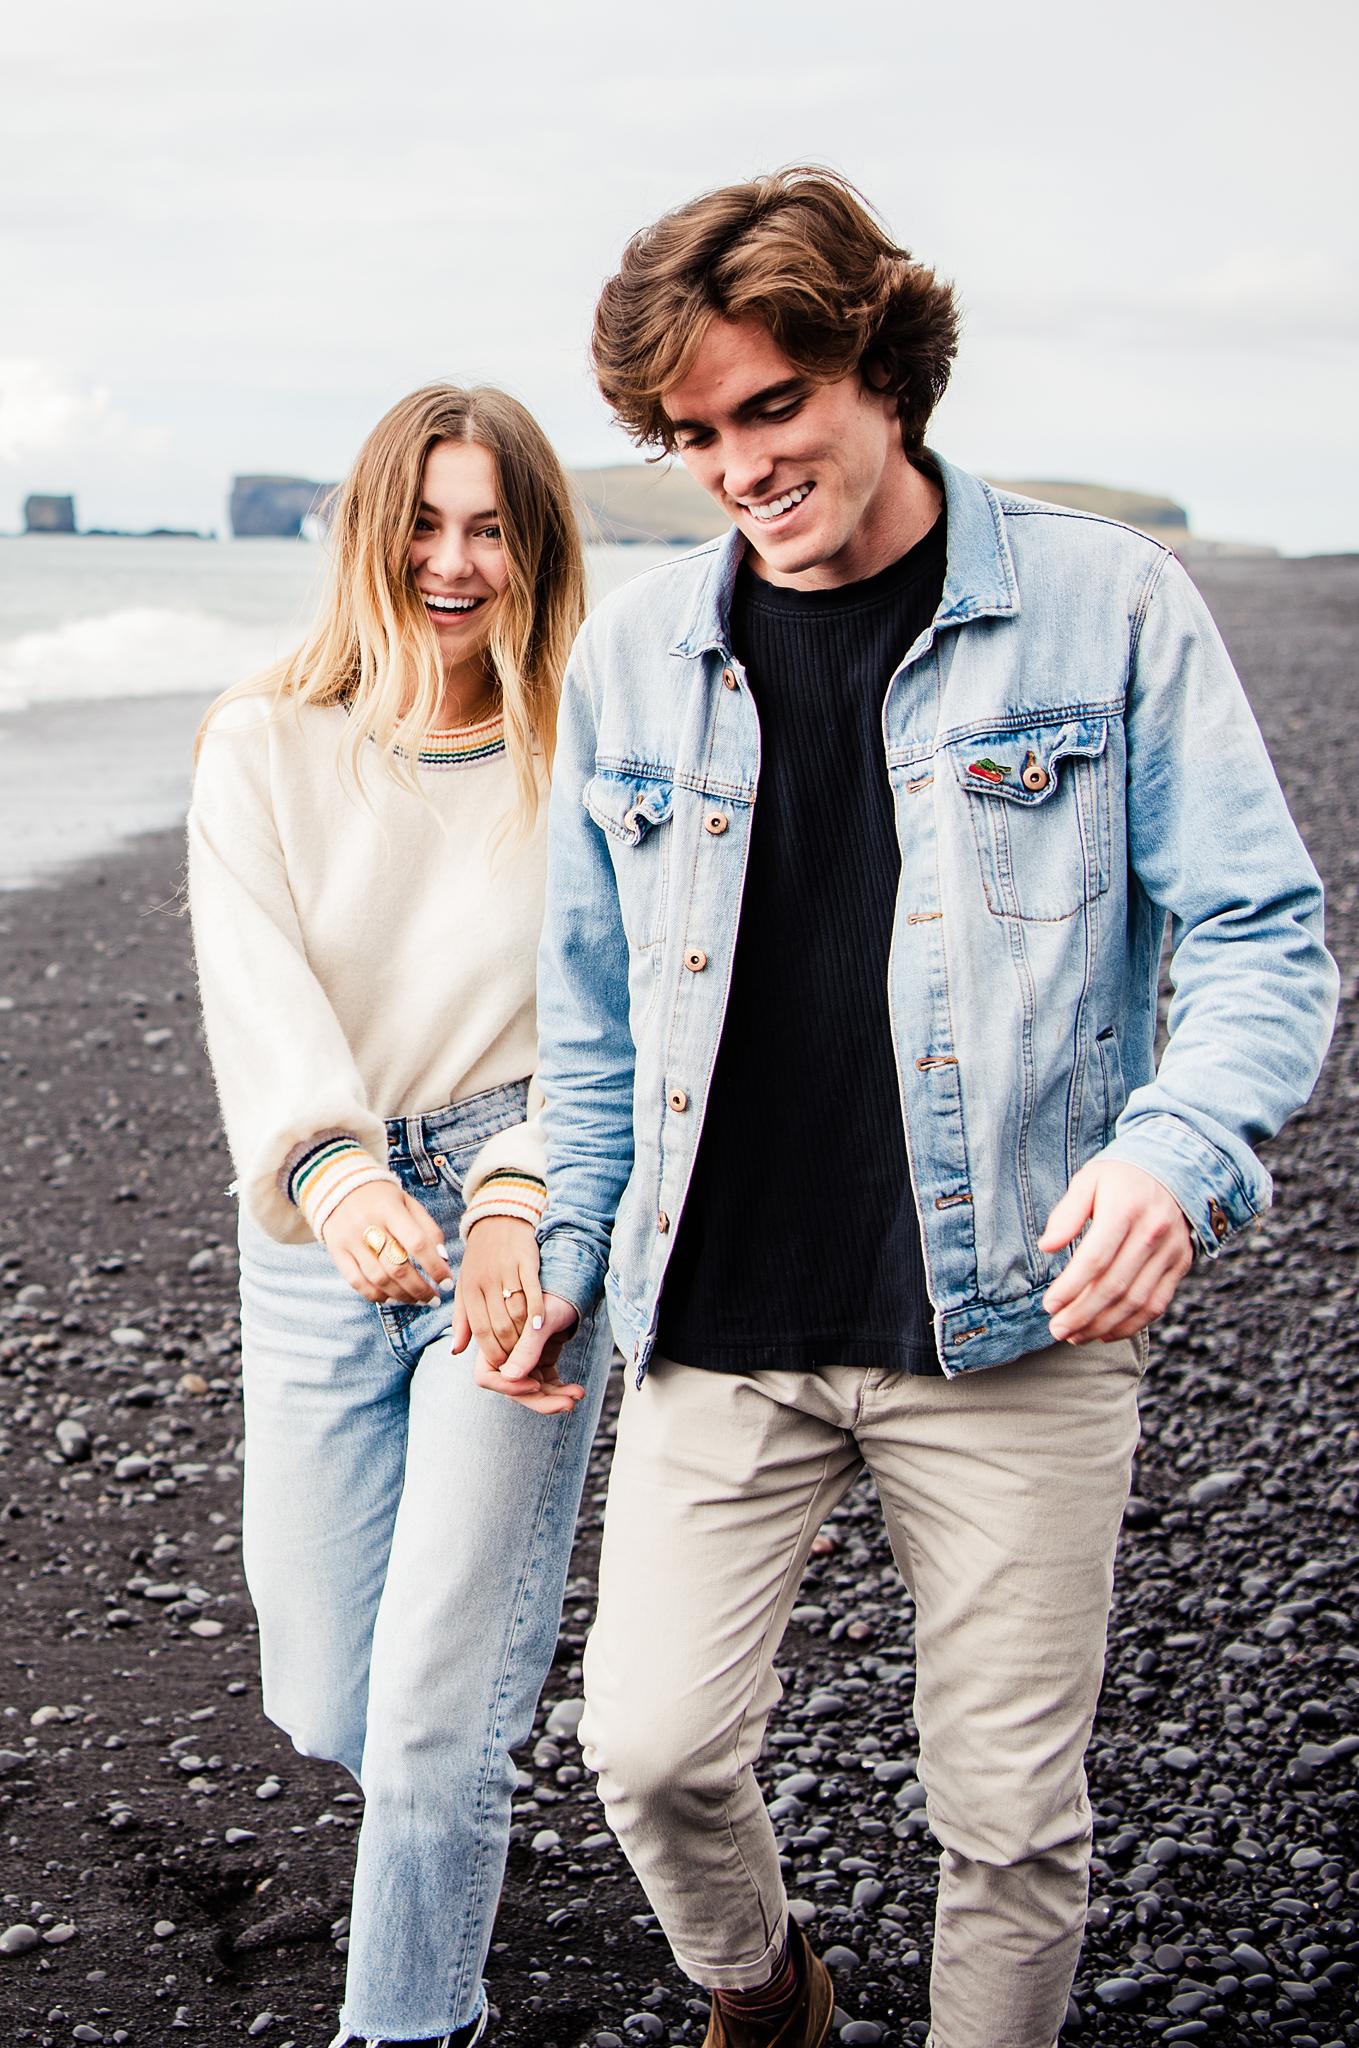 Iceland_Reynisfjara_Black_Sand_Beach_Couples_Session_JILL_STUDIO_Rochester_NY_Photographer_DSC_9695.jpg